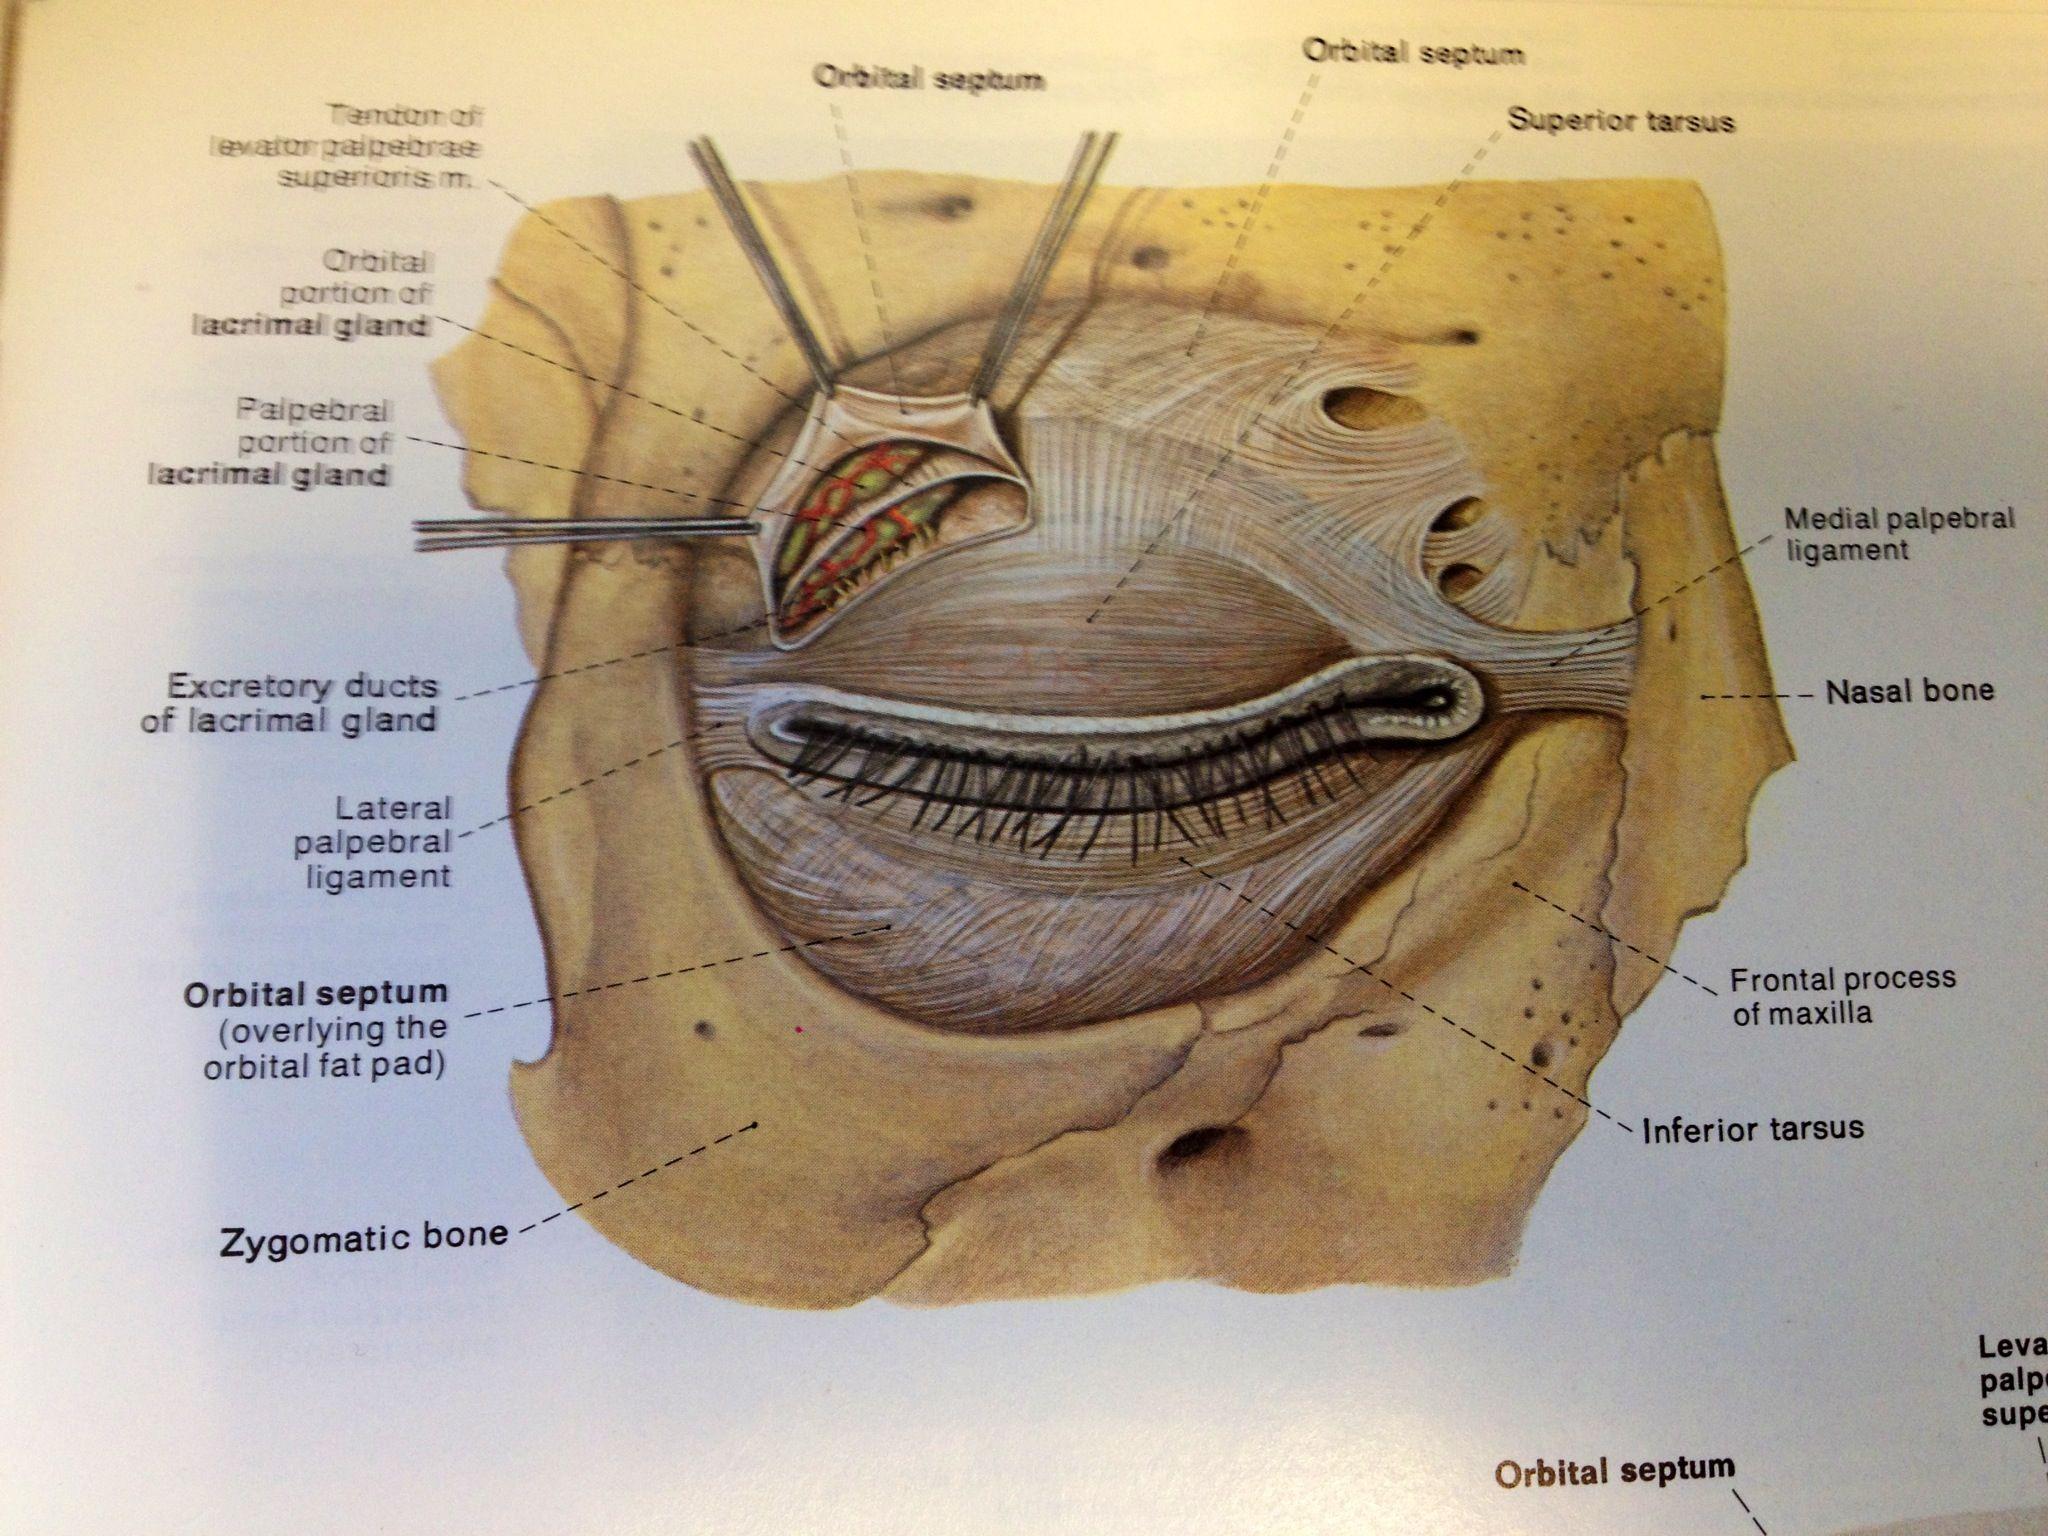 Image Eye Anatomy Orbital Septum